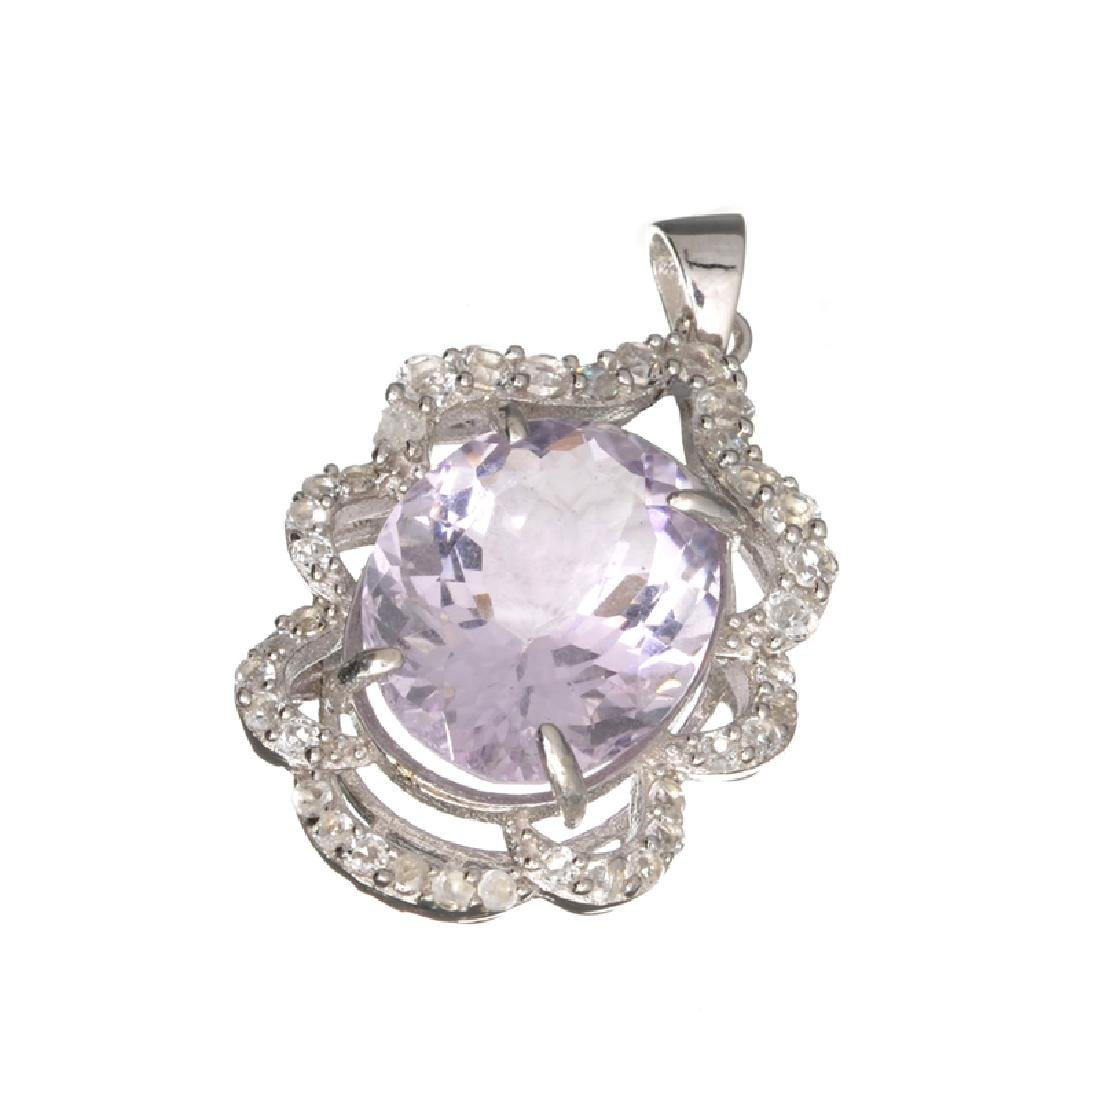 APP: 1.6k Fine Jewelry 9.16CT Amethyst Quartz And